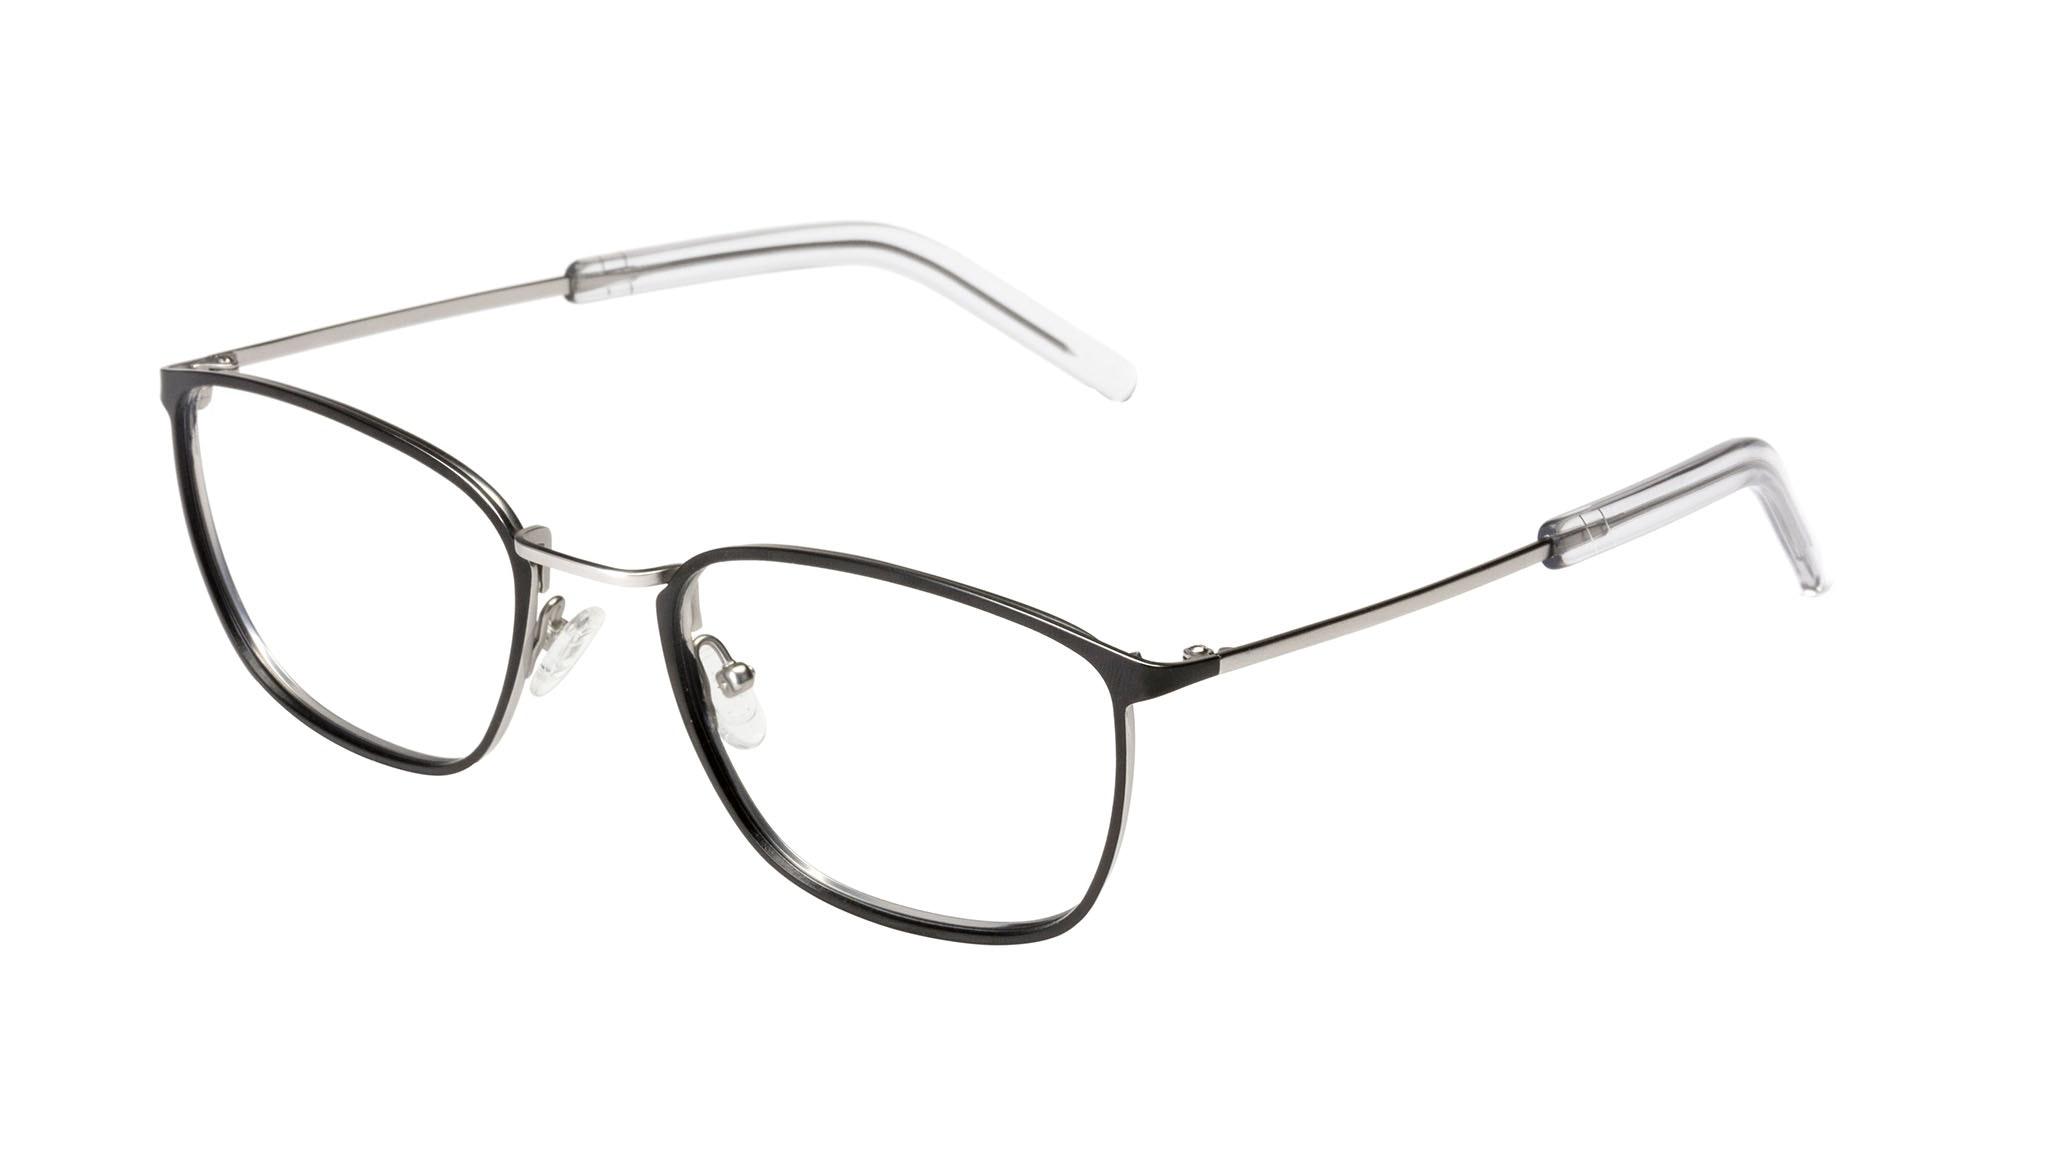 Affordable Fashion Glasses Rectangle Eyeglasses Men Edge Black Silver Tilt